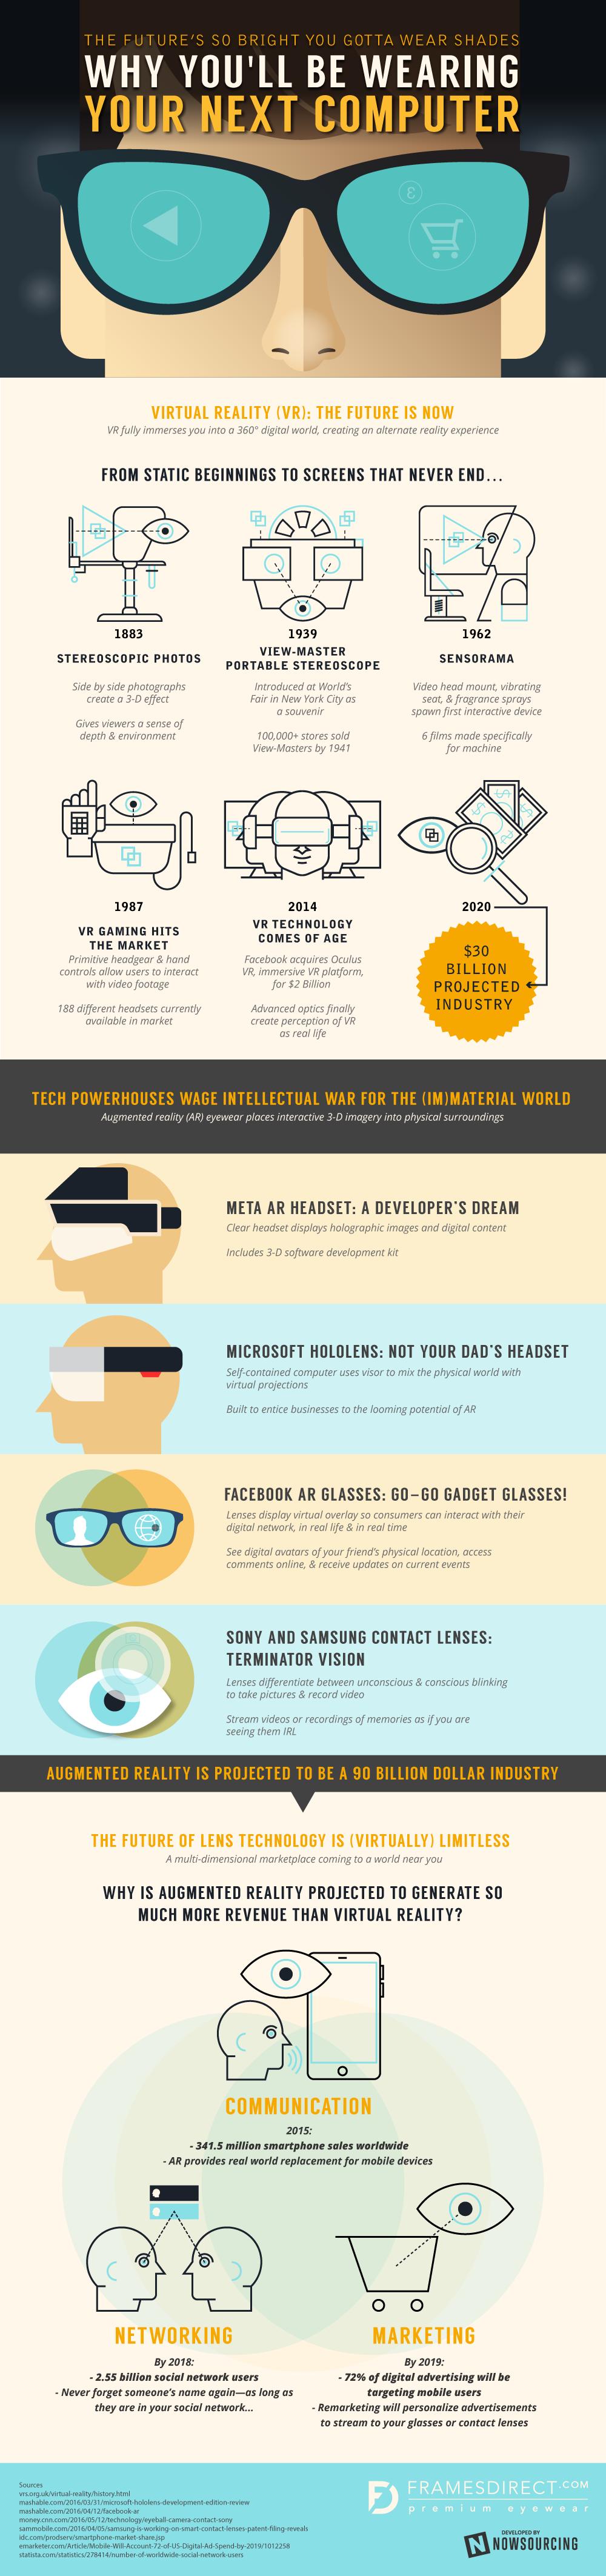 virtual-reality-and-the-future-of-social-media_576c3e240949c